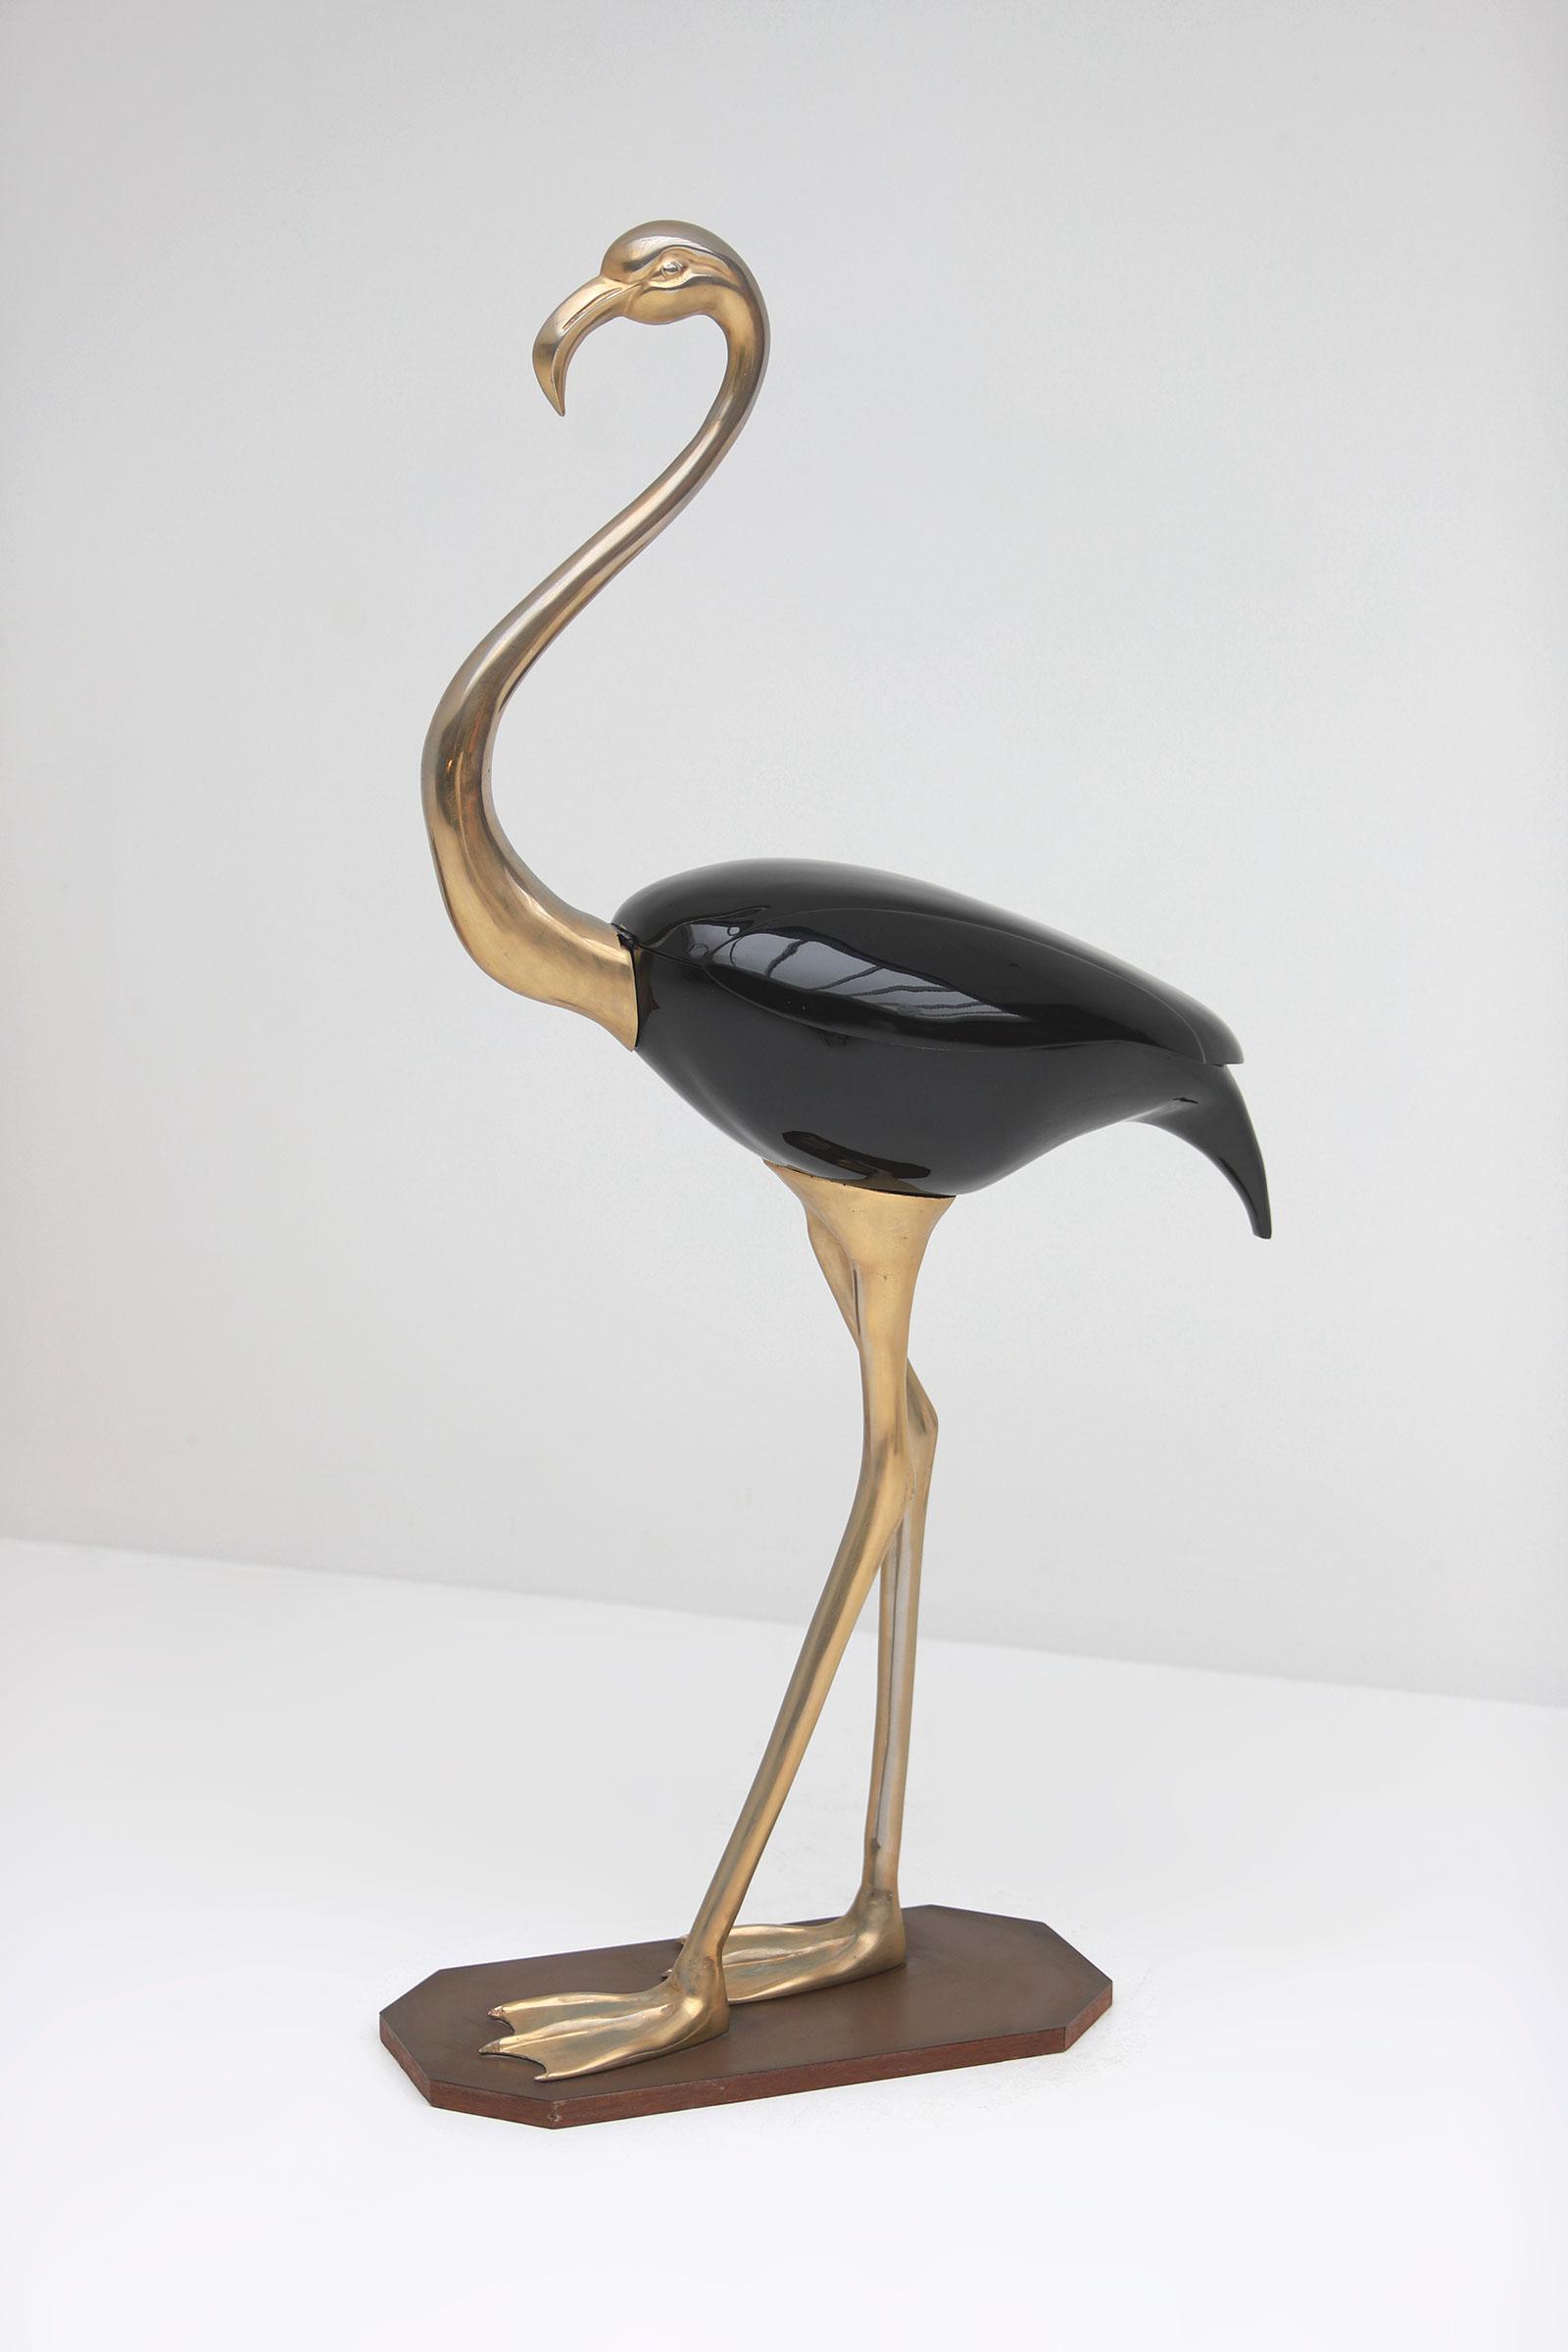 Fondica Lifesize Brass Flamingo 1970simage 2